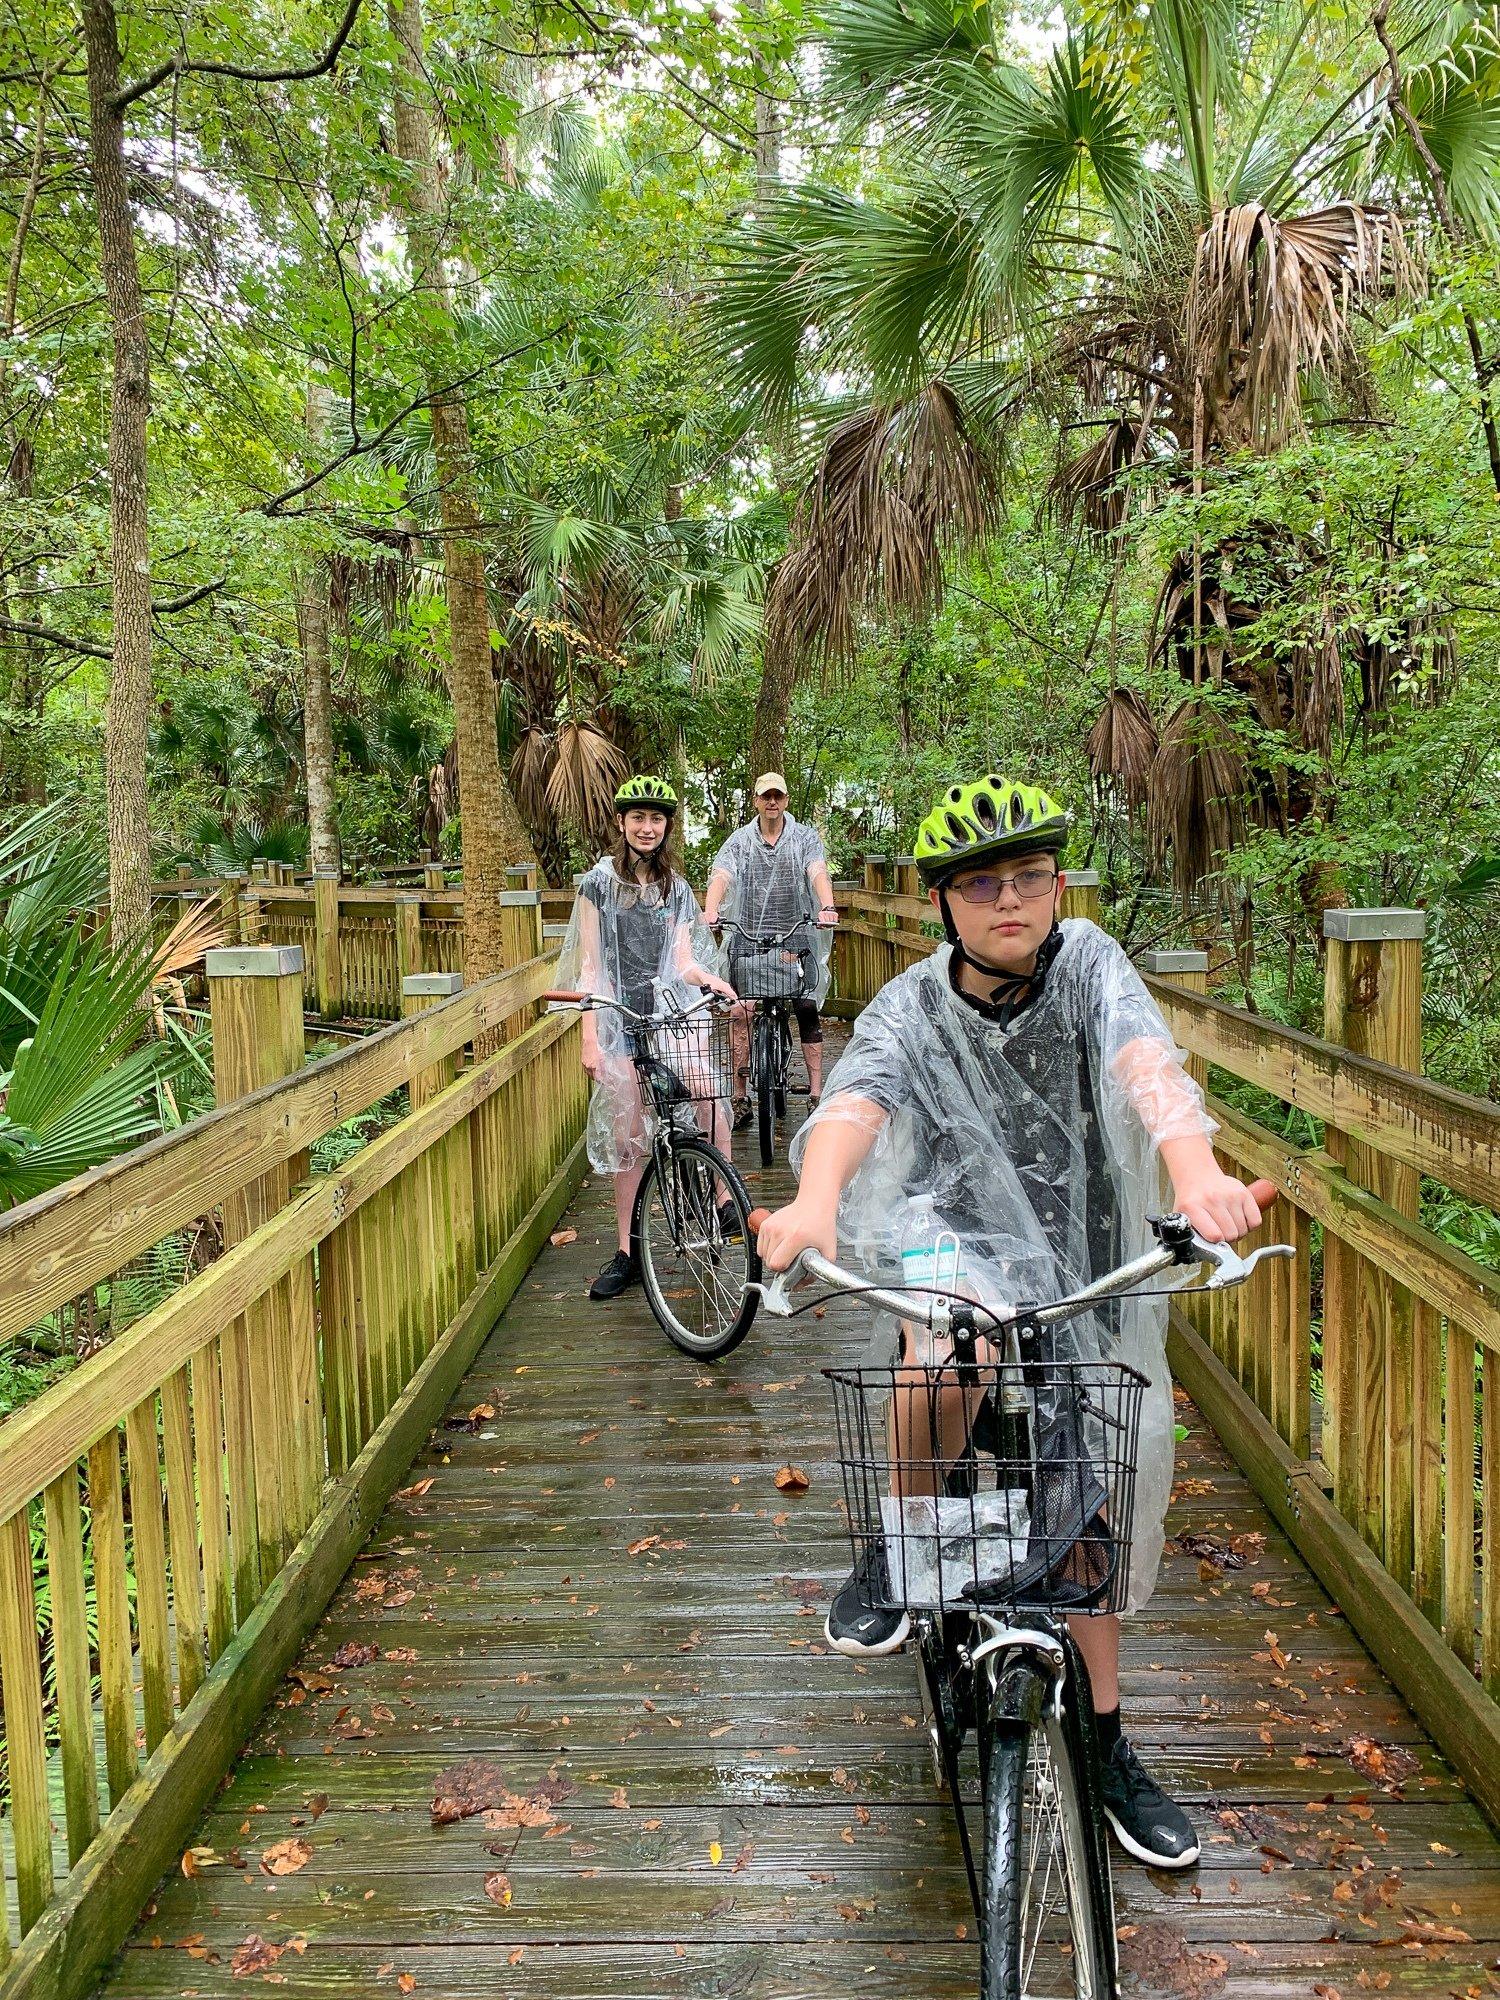 Guided family bike tour with Celebration Bike Rental